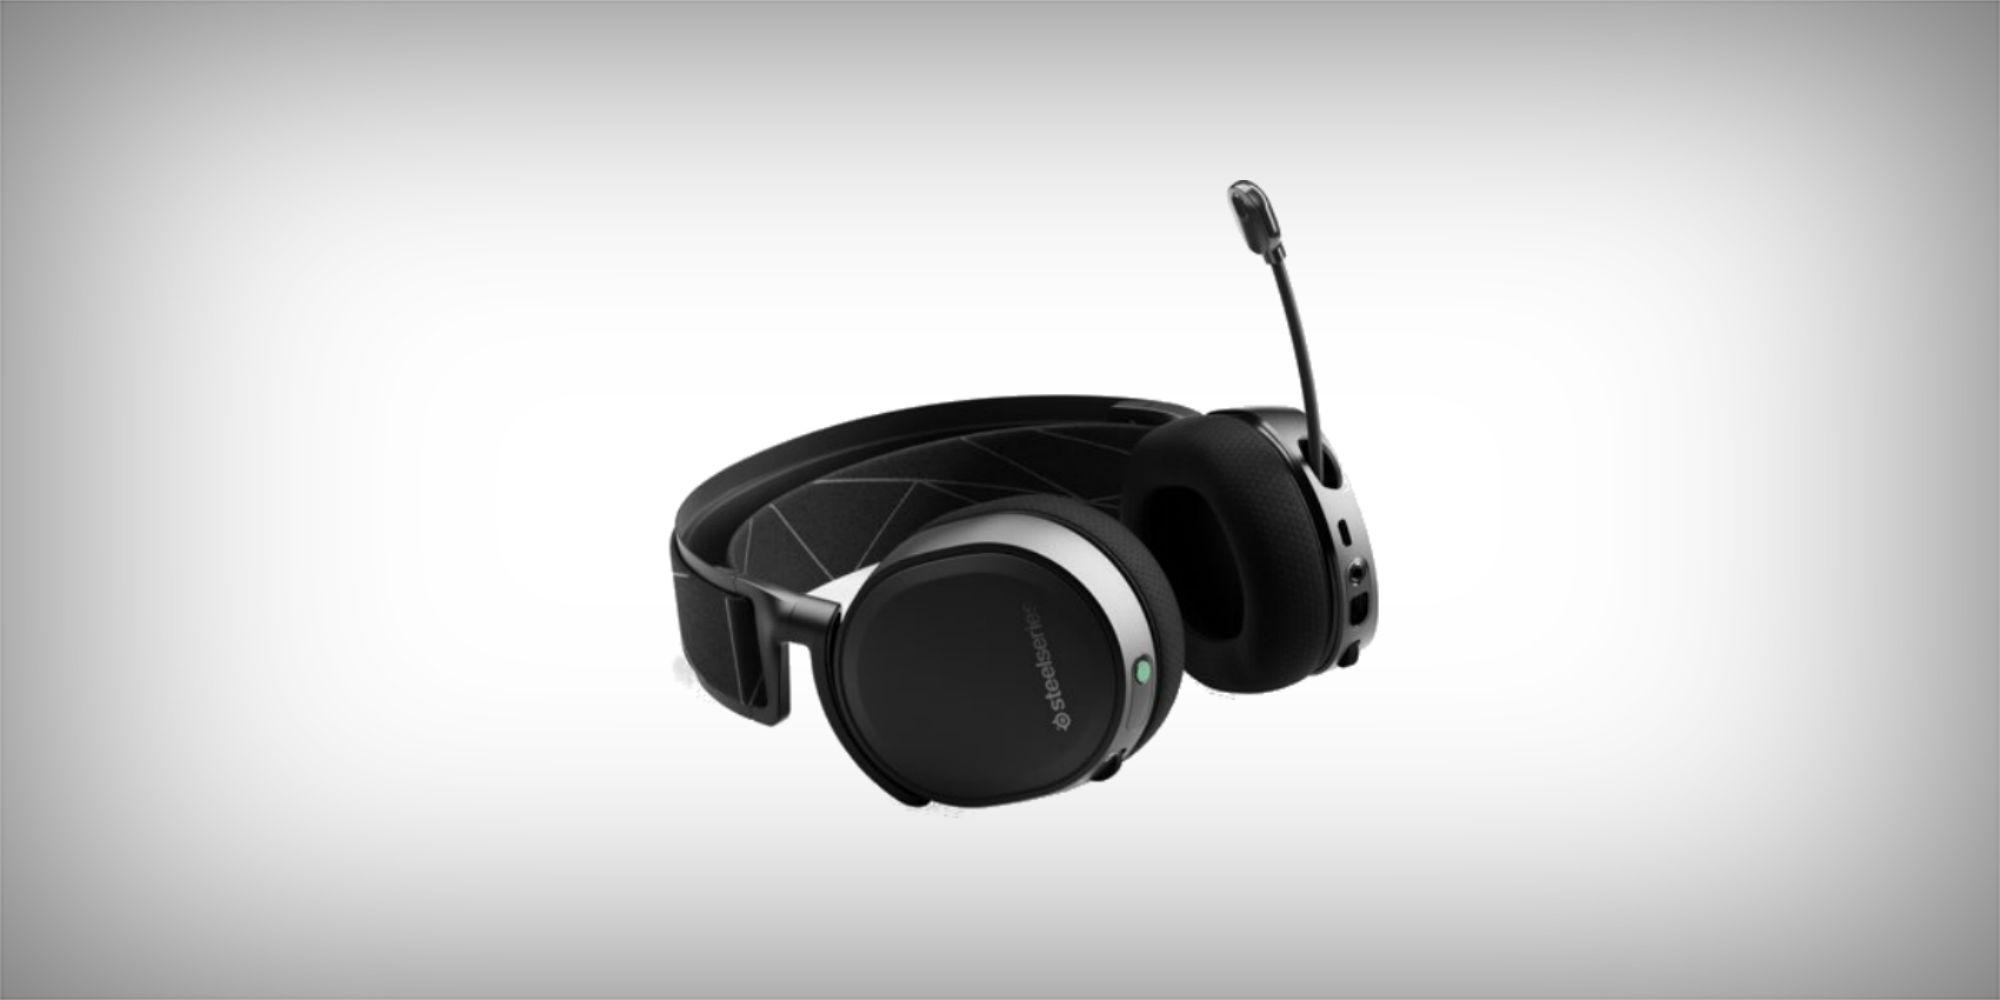 Draadloze gaming headset Bol.com